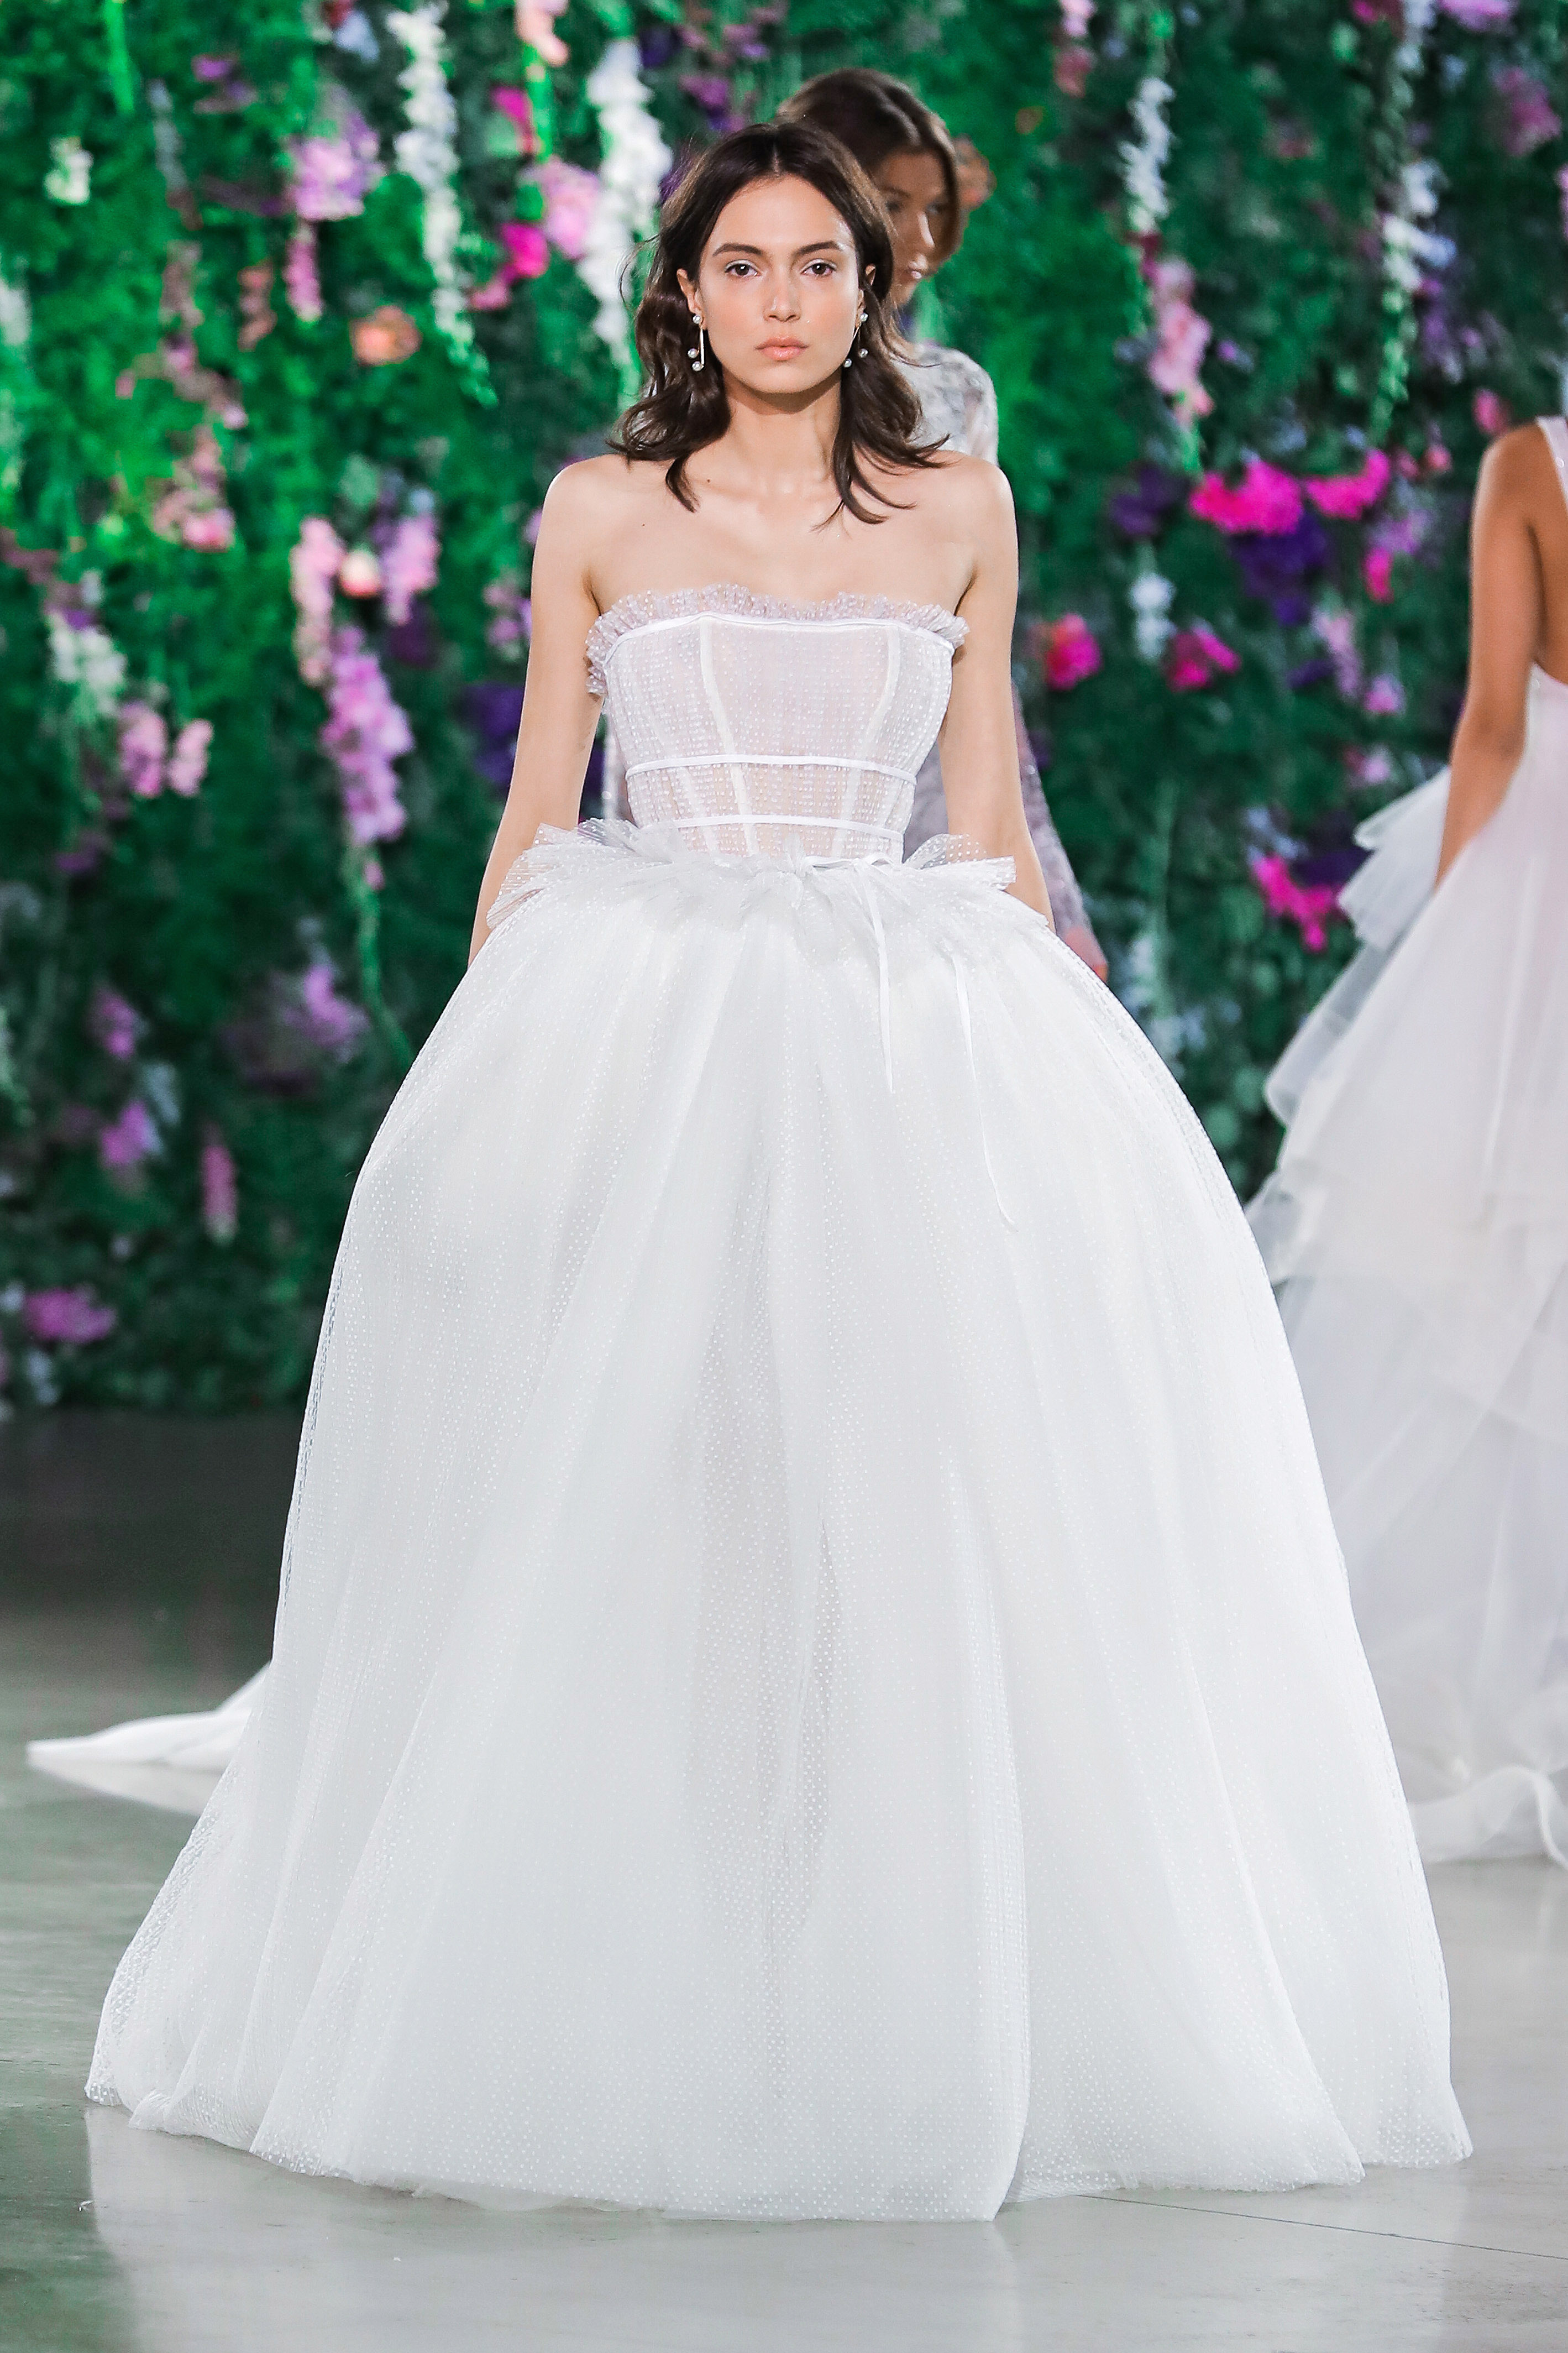 Galia Lahav Halter with Puffed Skirt Wedding Dress Fall 2018